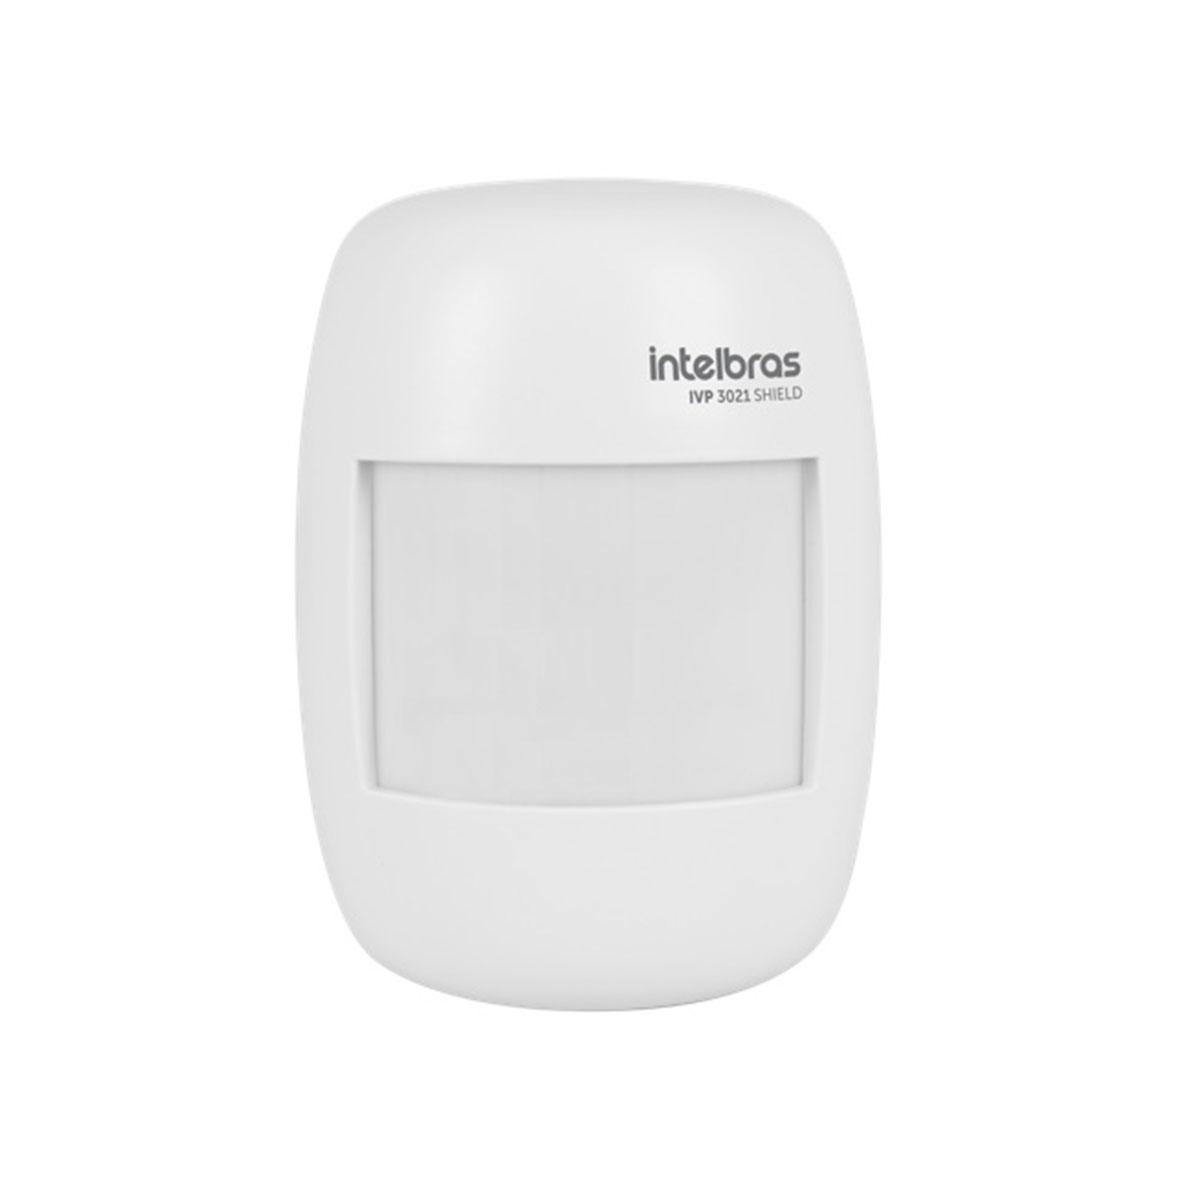 Kit 10 Sensor Interno Com Fio Intelbras Ivp 3021 Shield